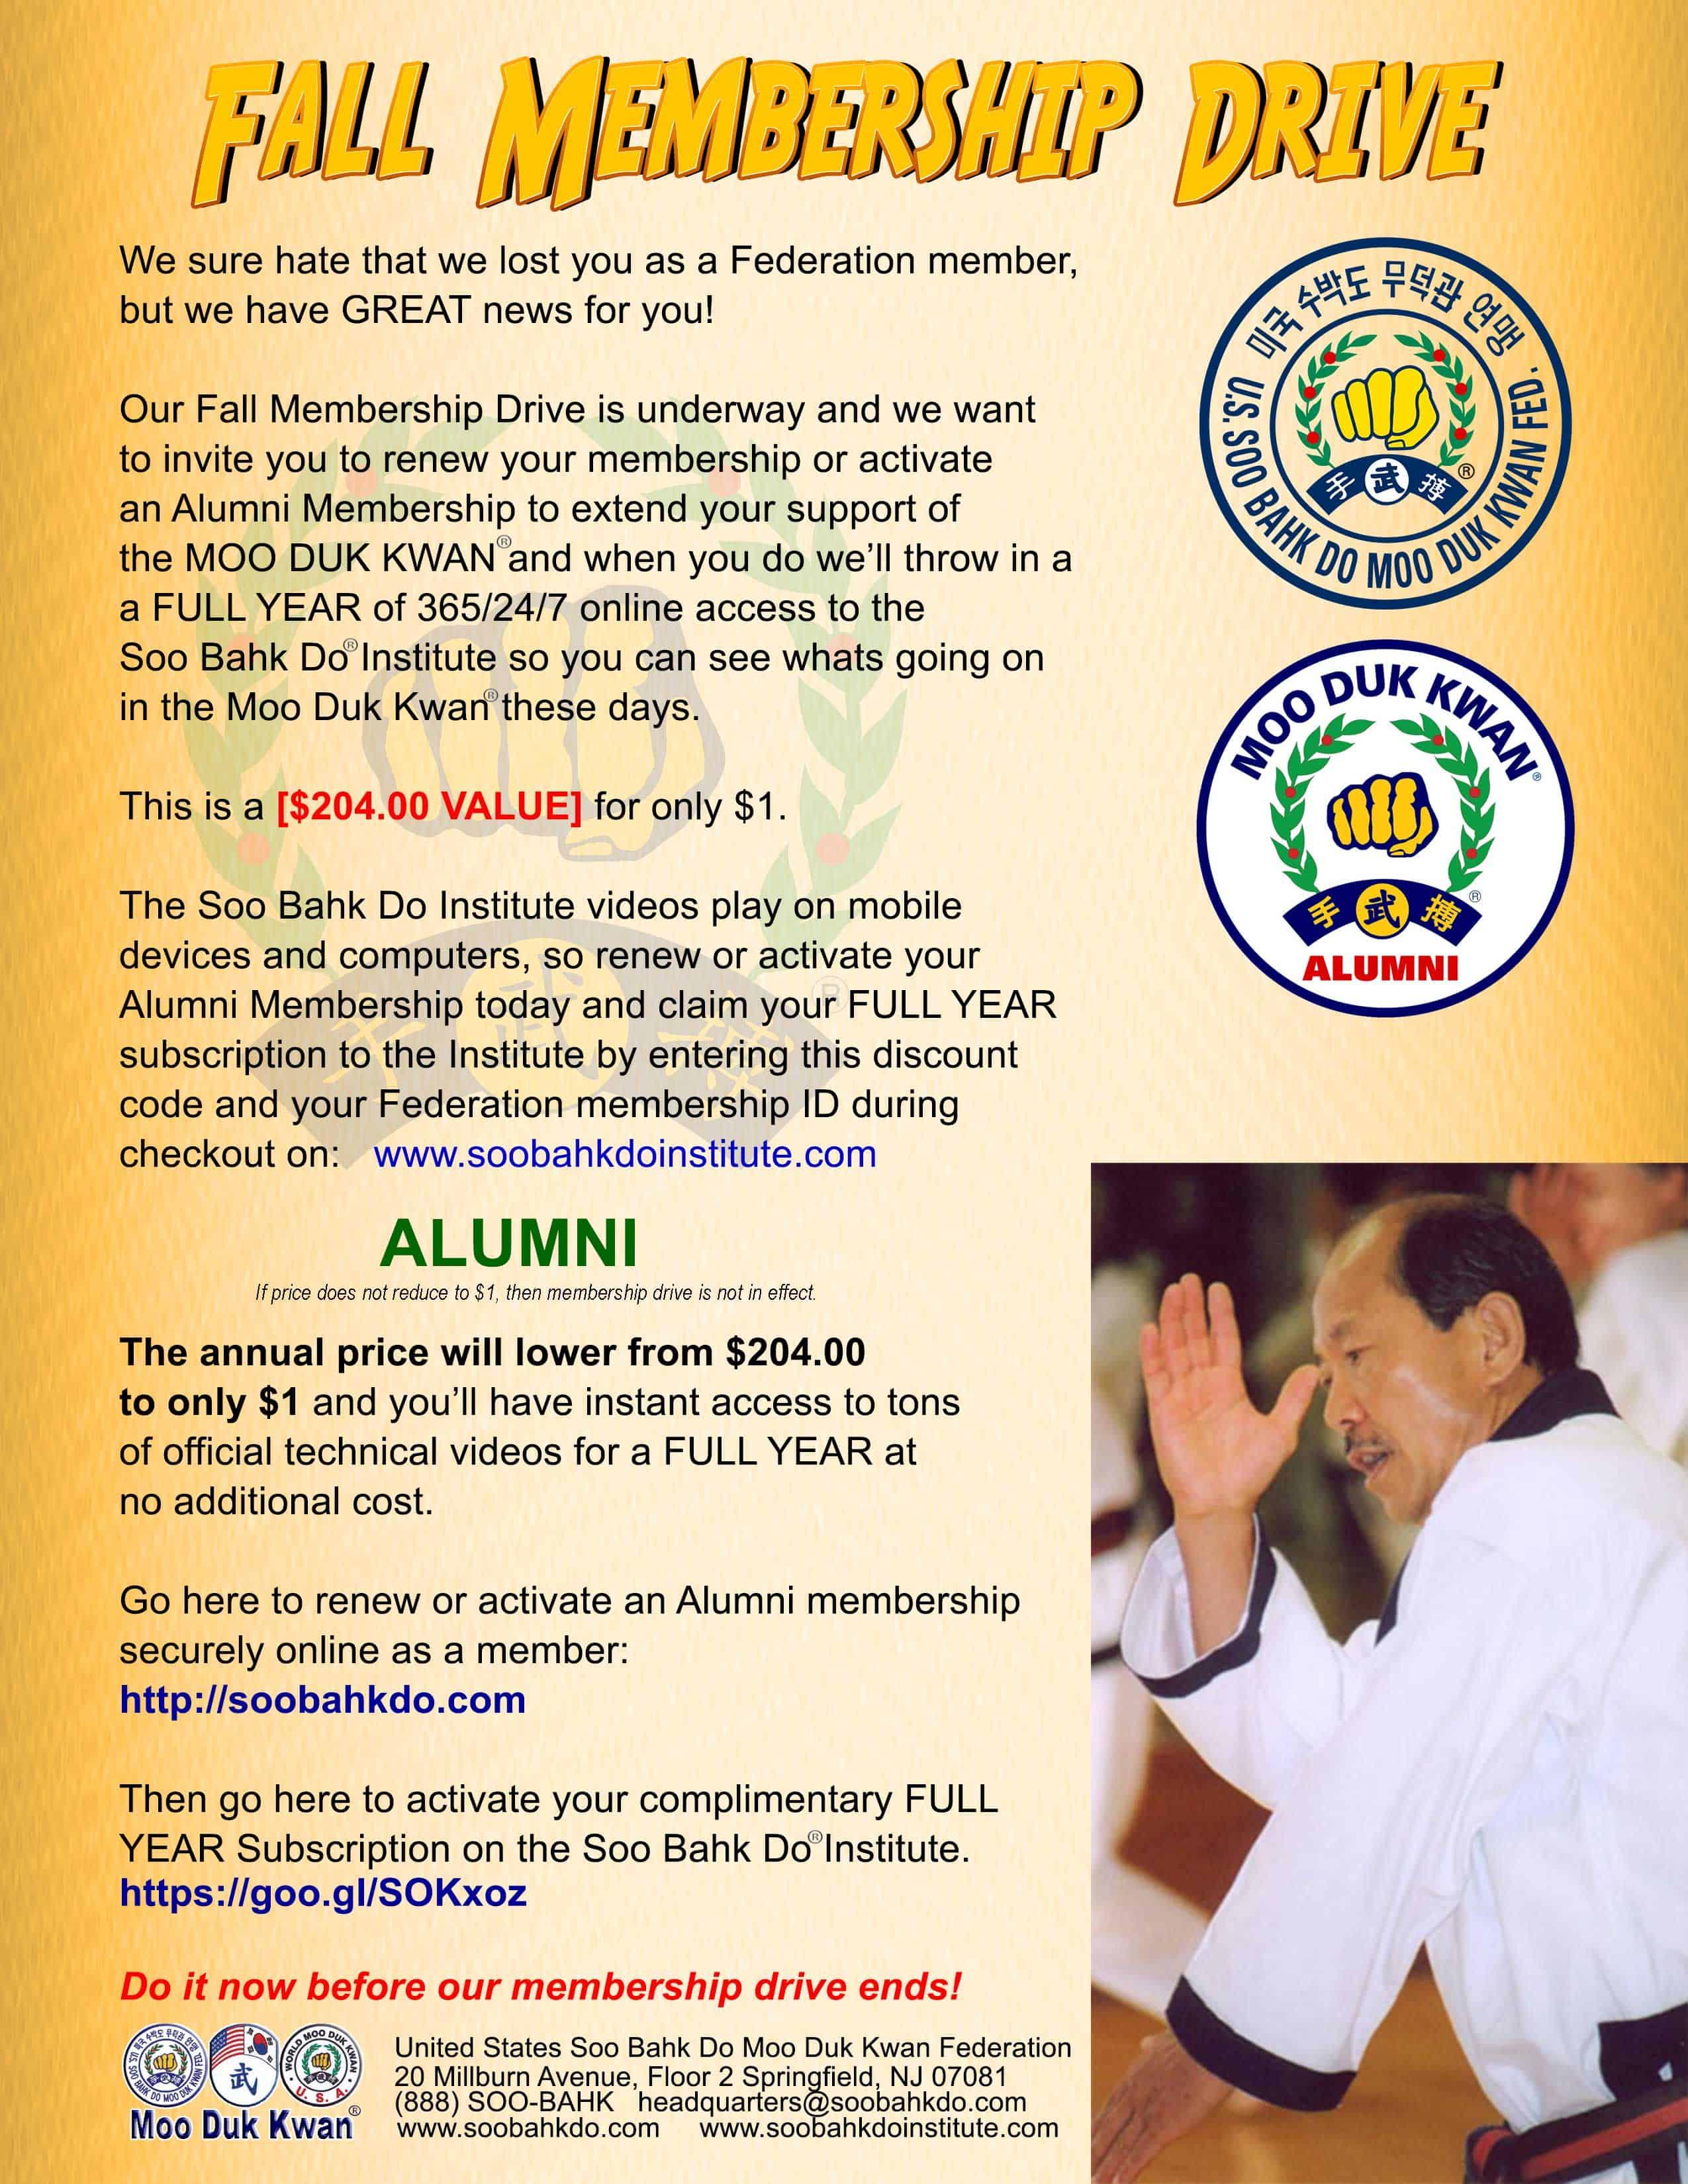 Membership-Drive-Expired-And-Alumni-v7-med-2550x3300d